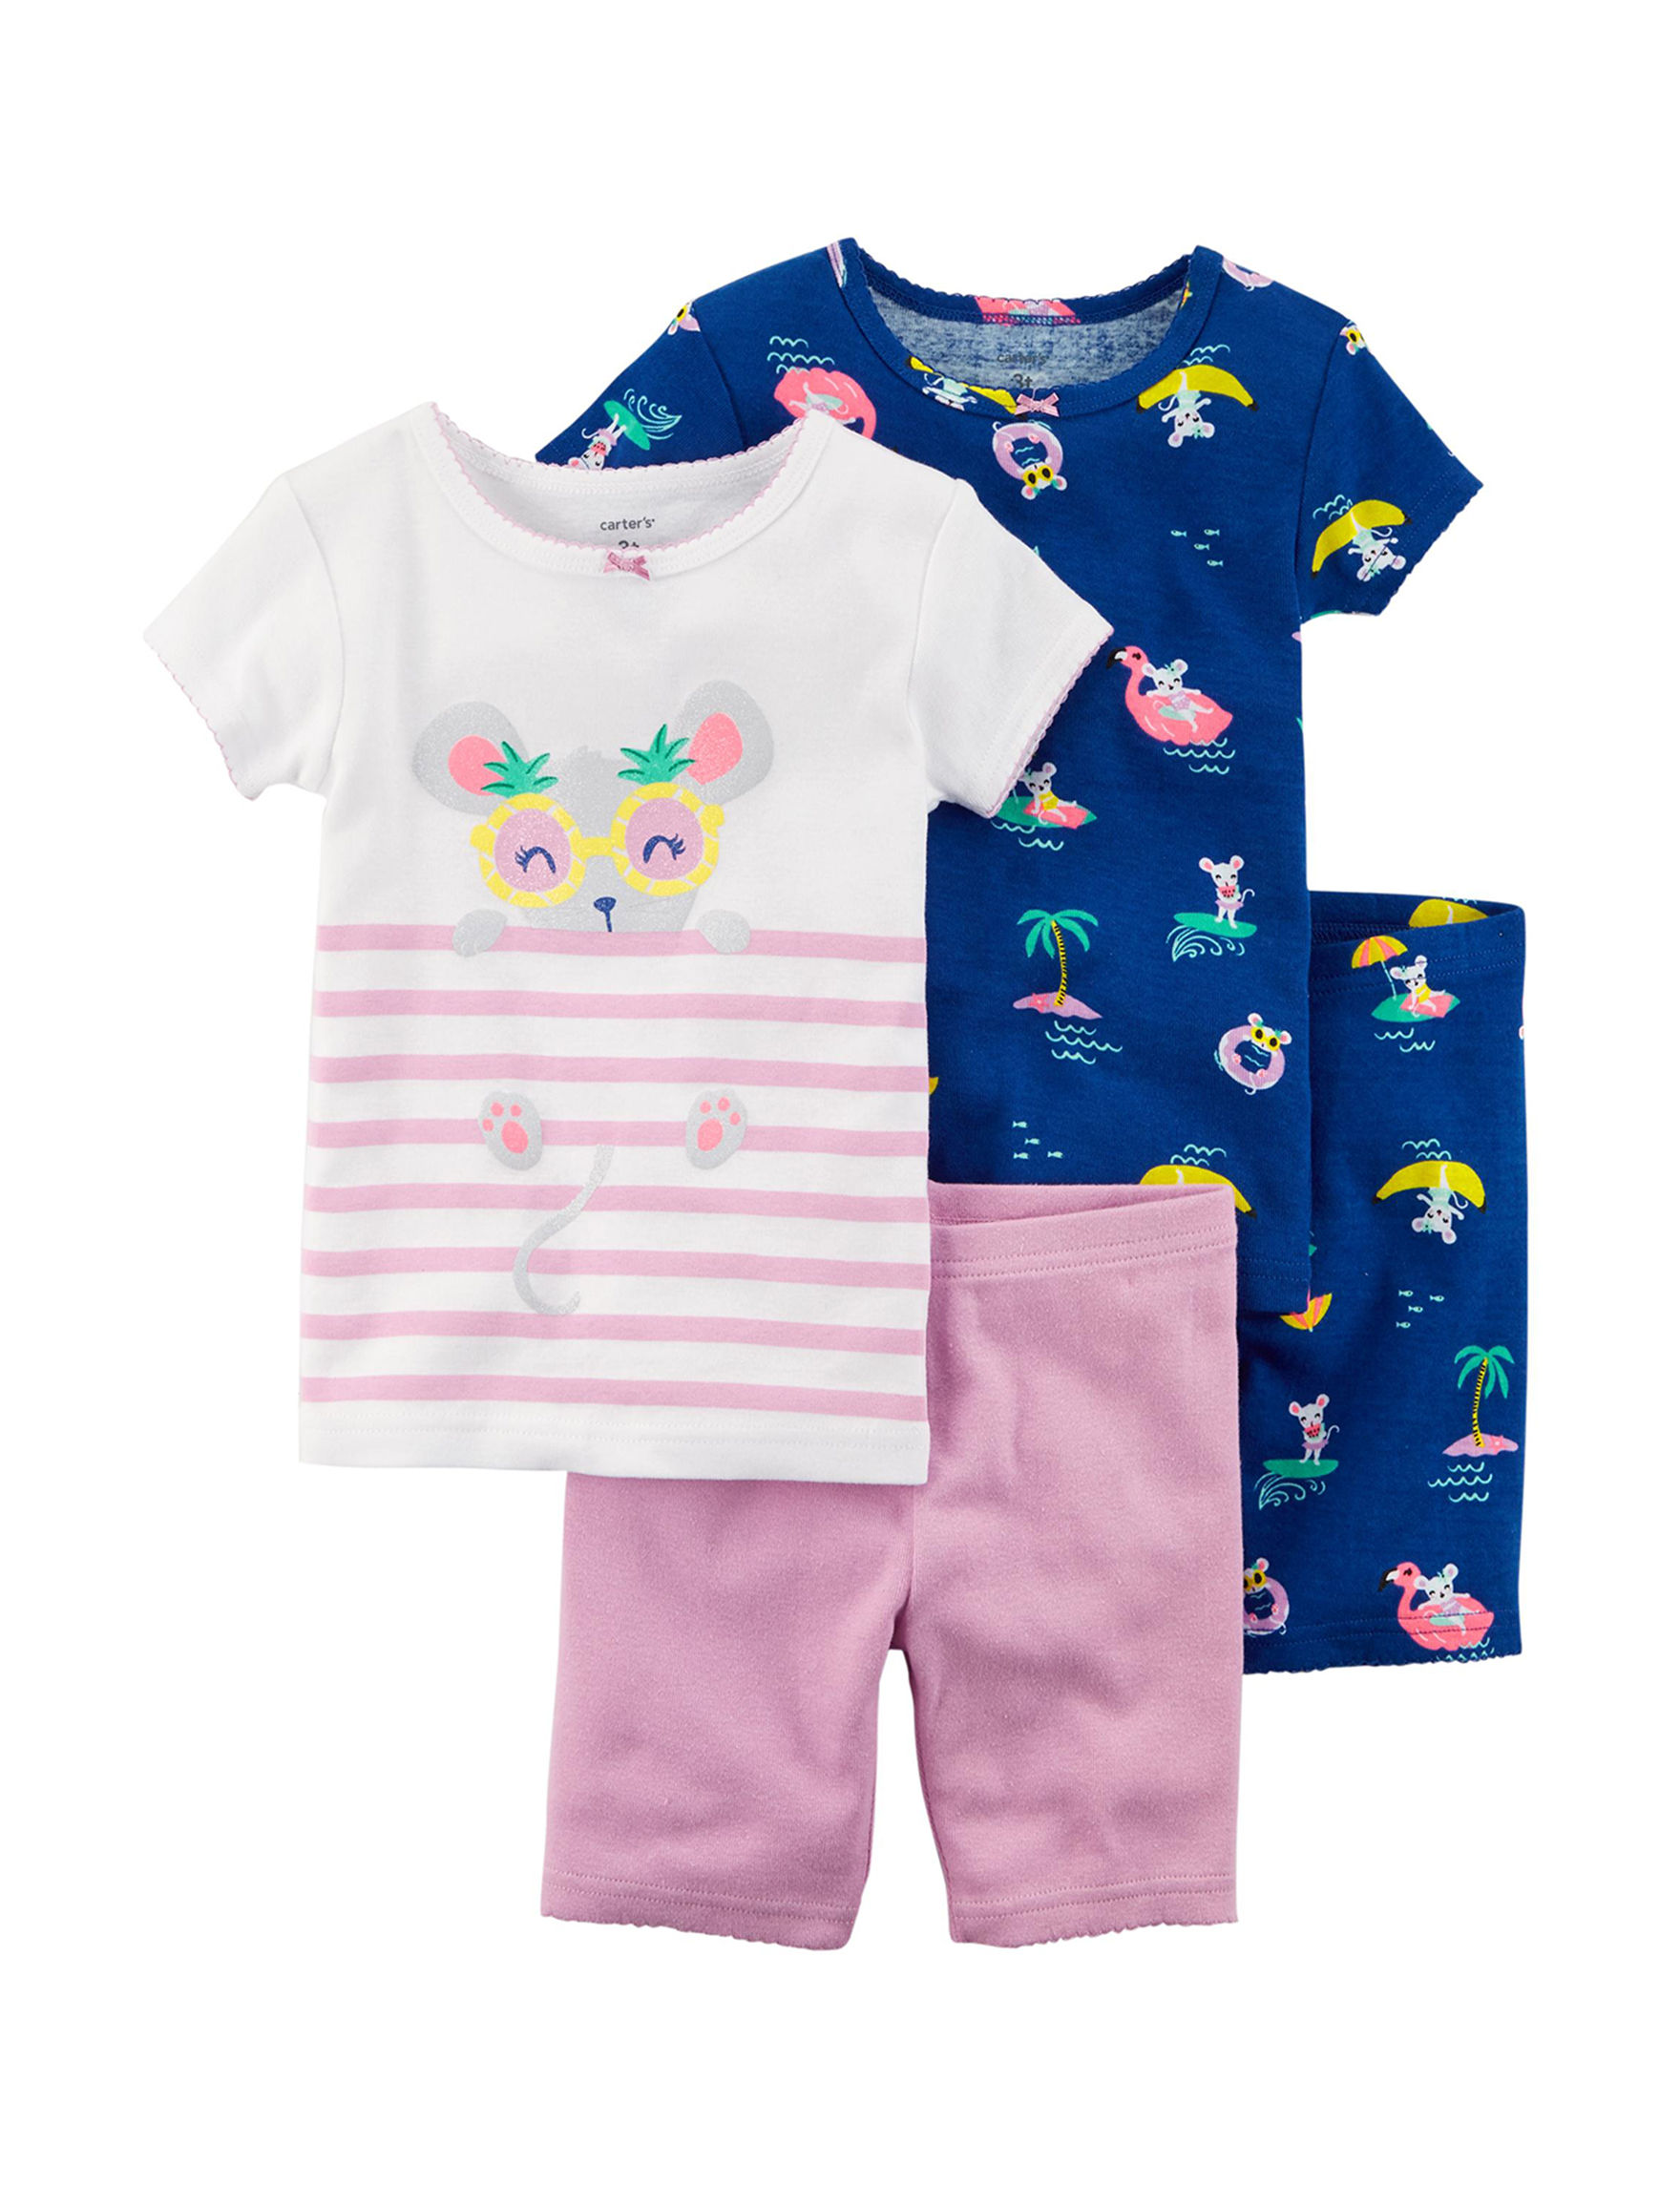 Carter's Pink / Blue Pajama Sets